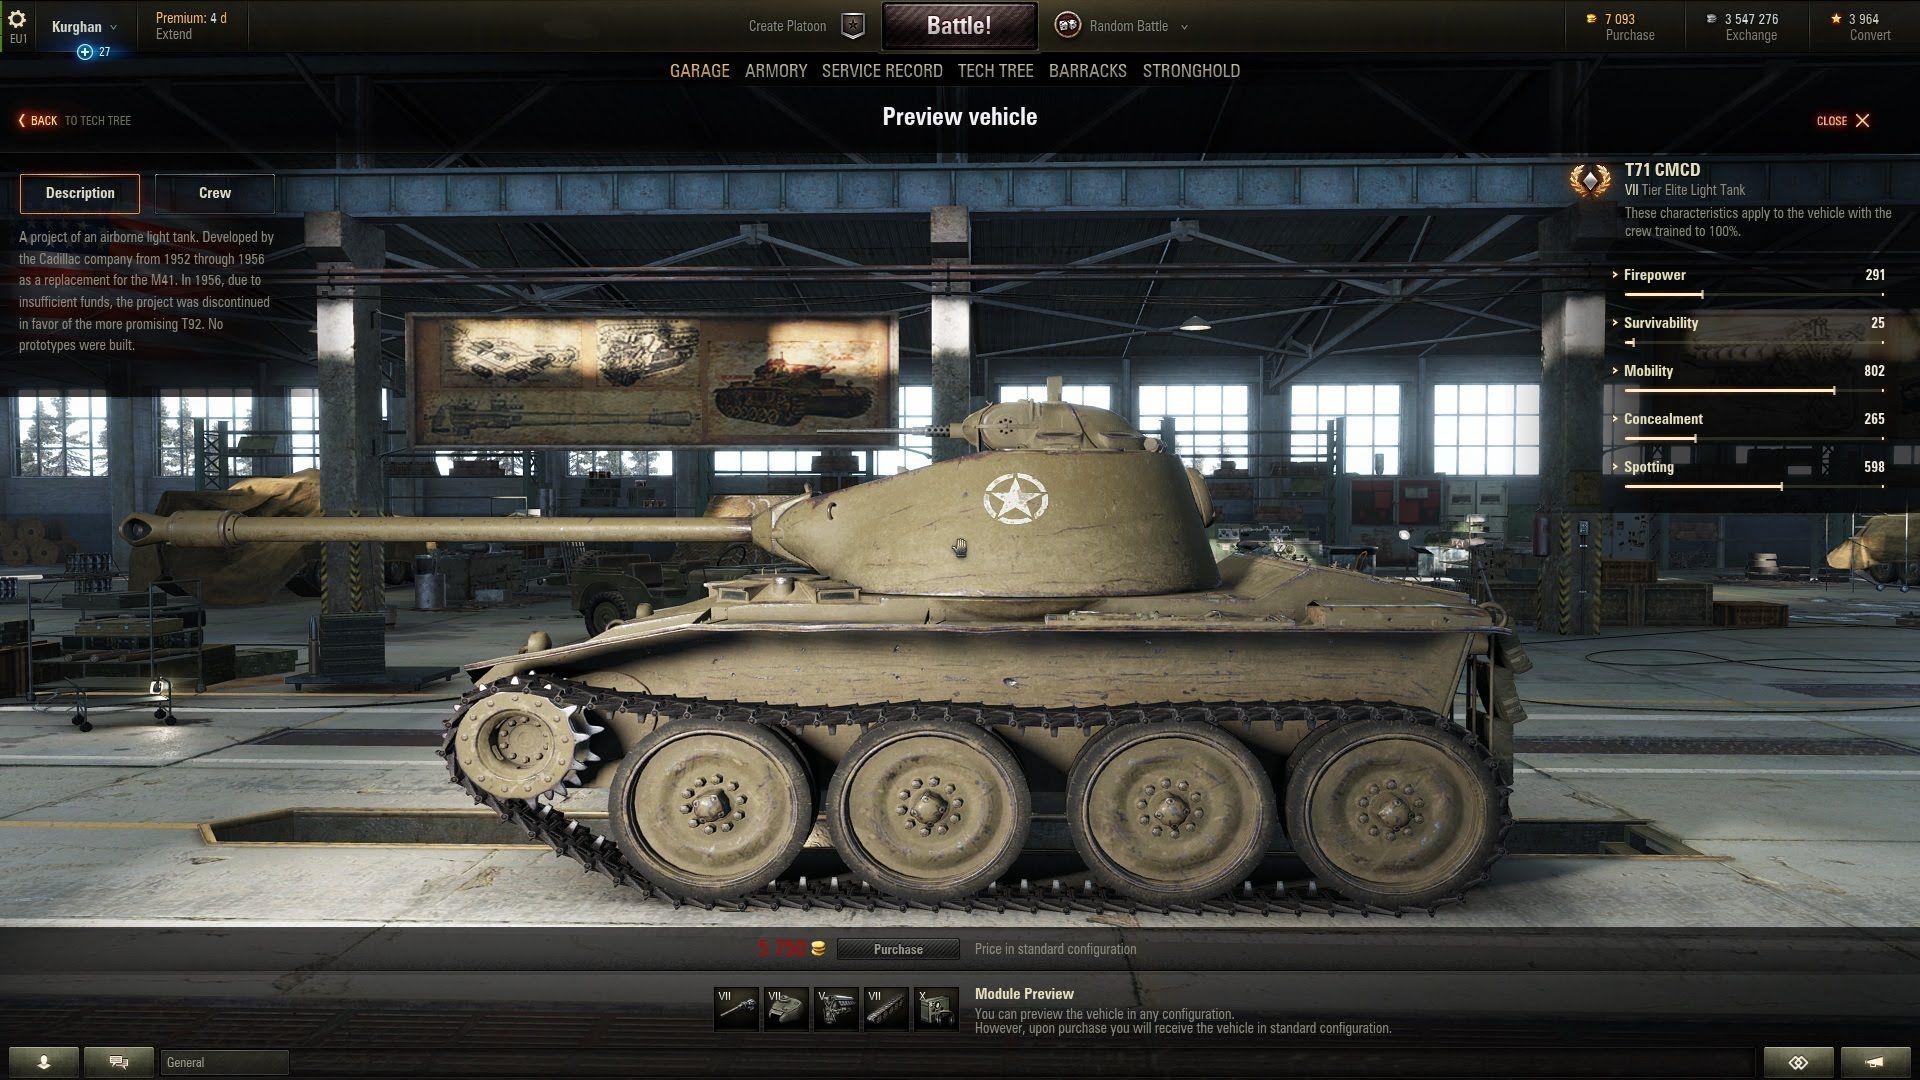 57f7f643e8b2abca84a6b7b78e2583e9 - How To Get Premium Tanks In World Of Tanks